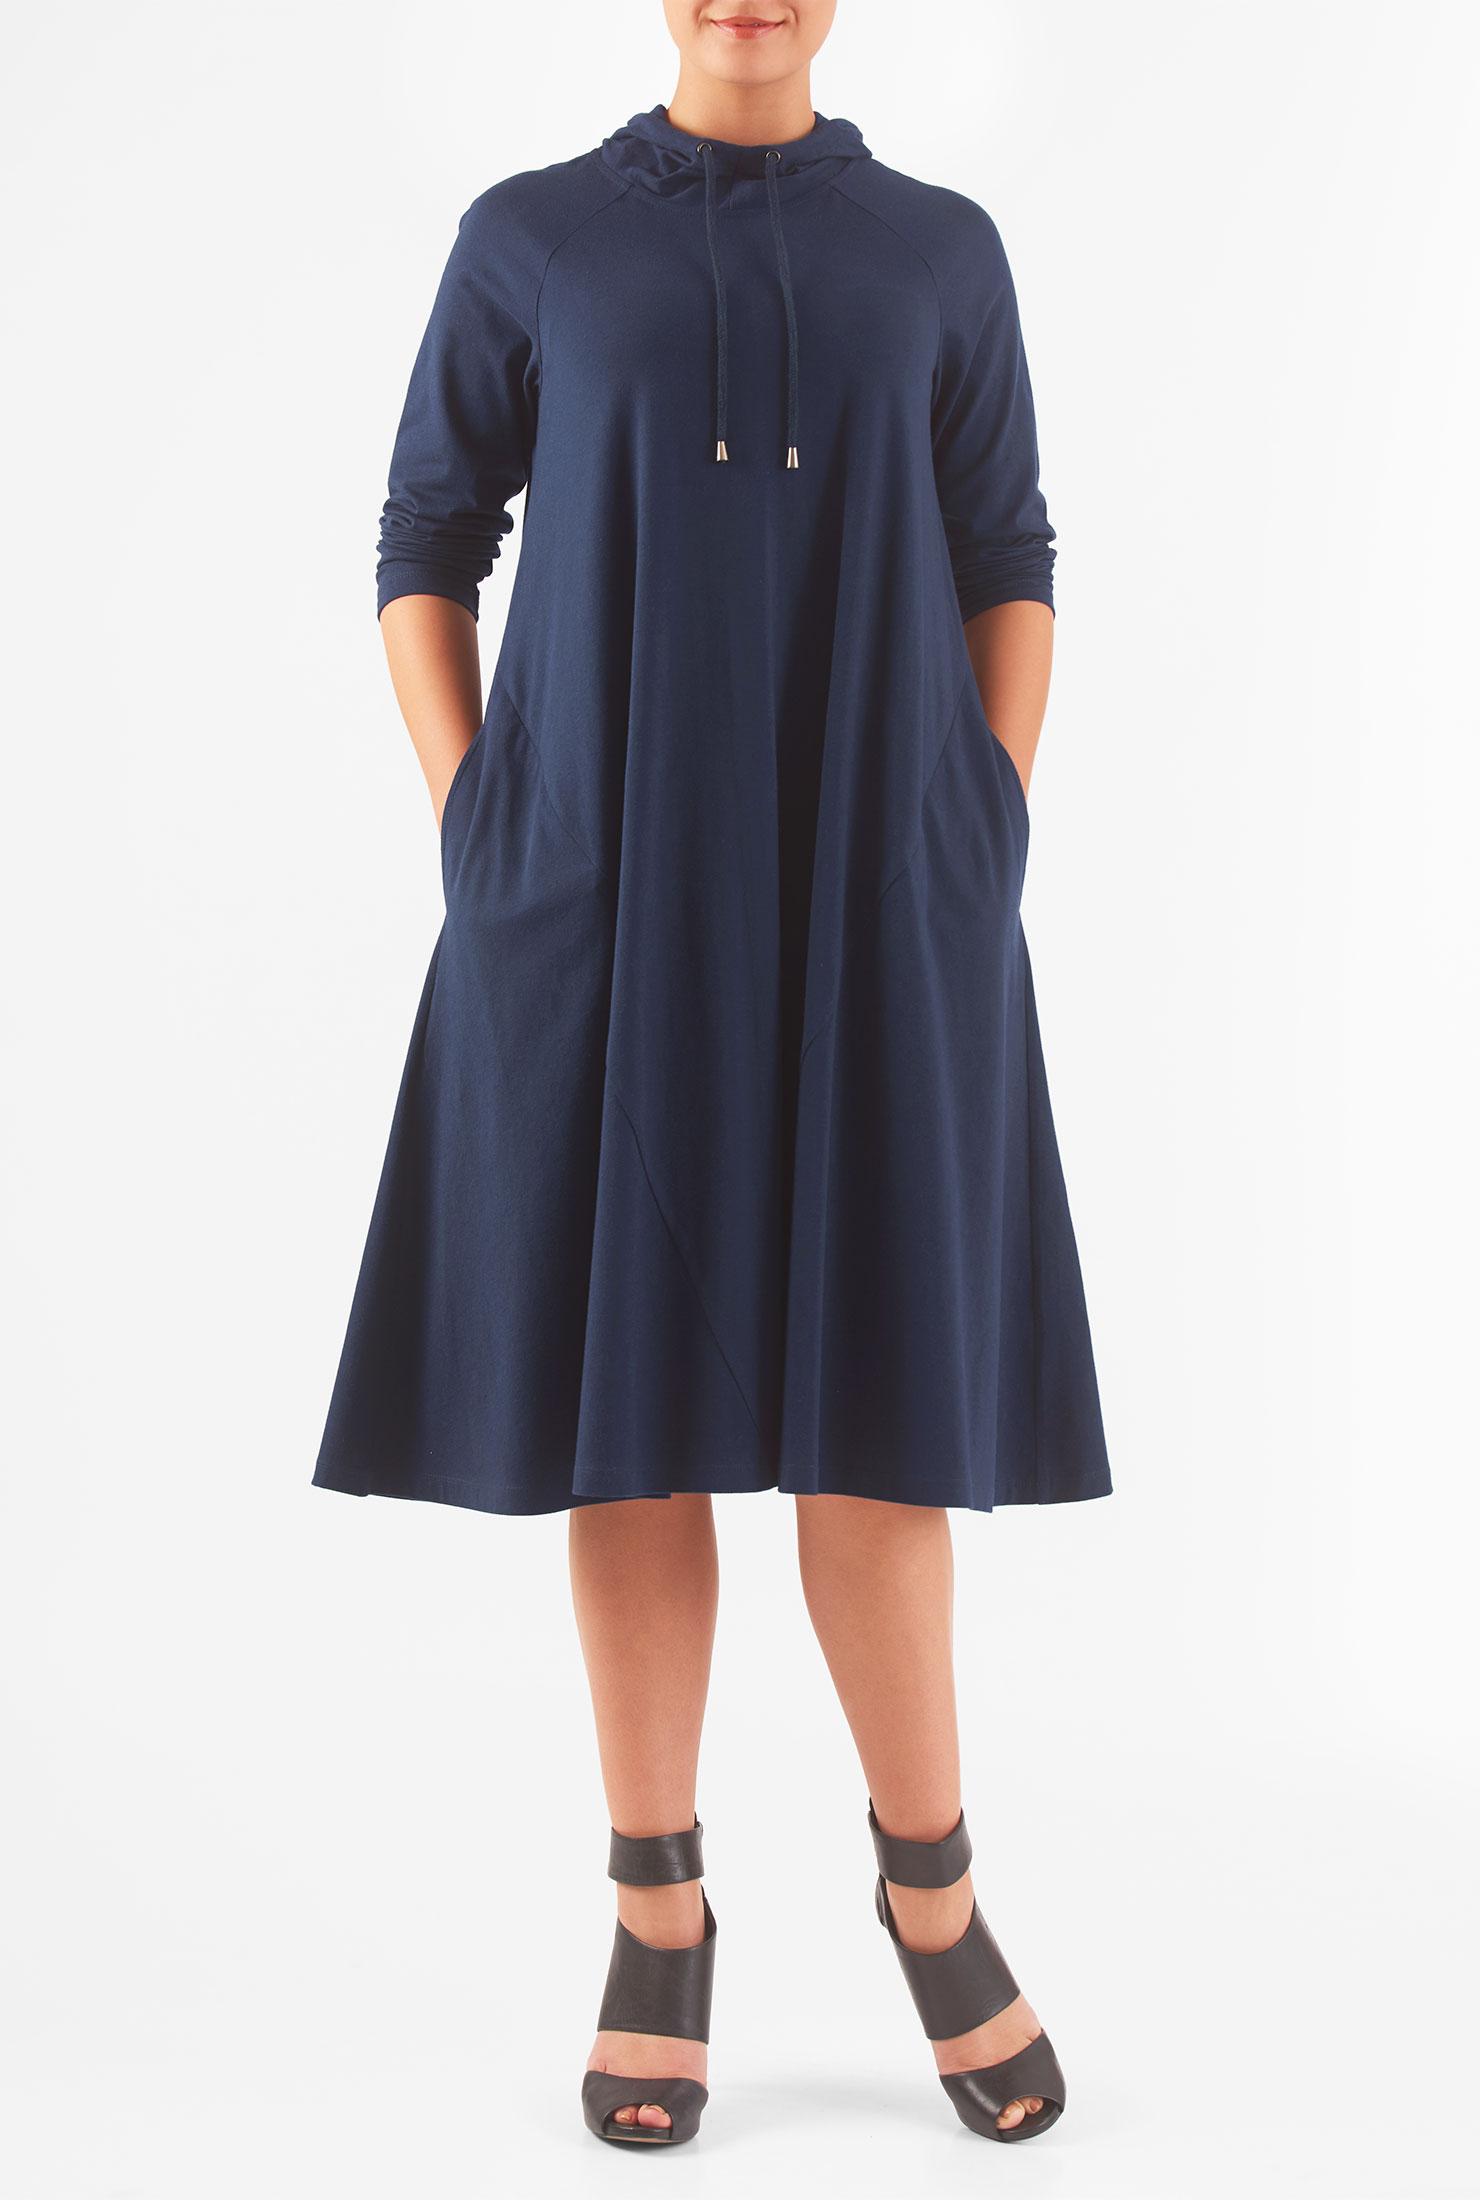 Eshakti Womens Hoodie Cotton Knit Shift Dress